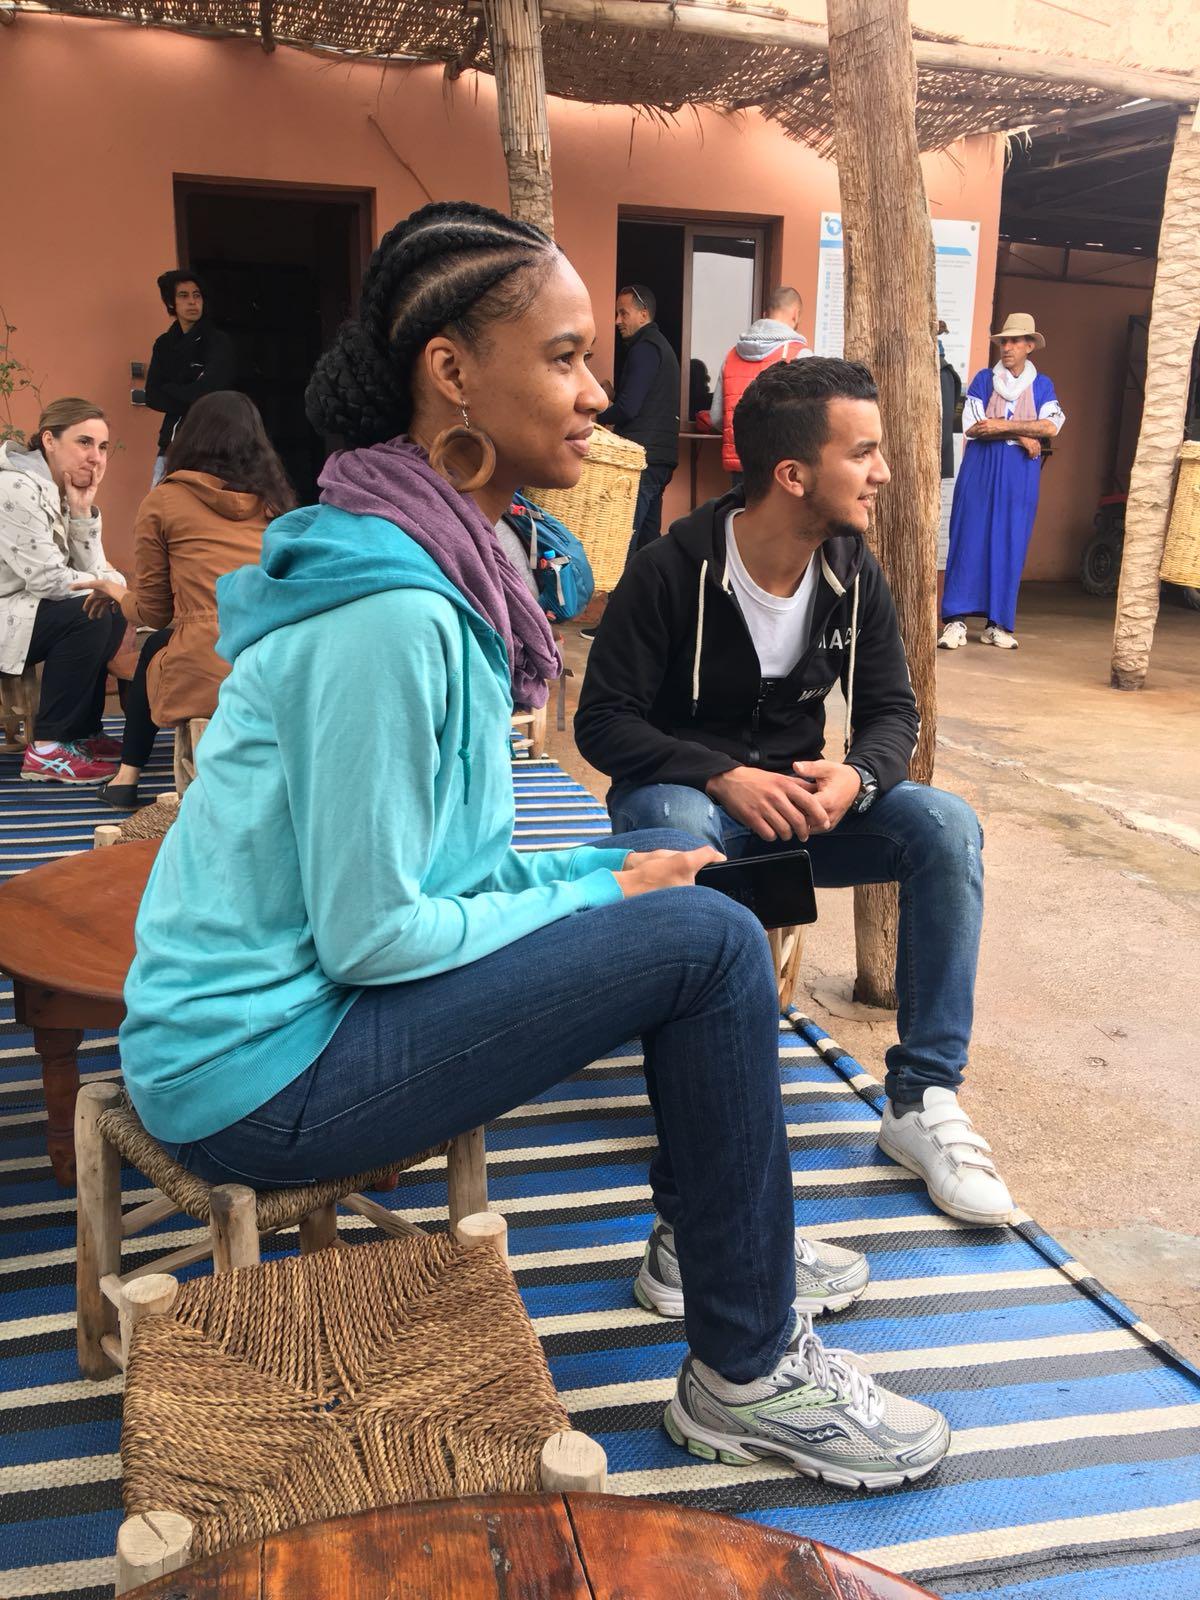 Lost & Found Marrakech April 2018.JPG